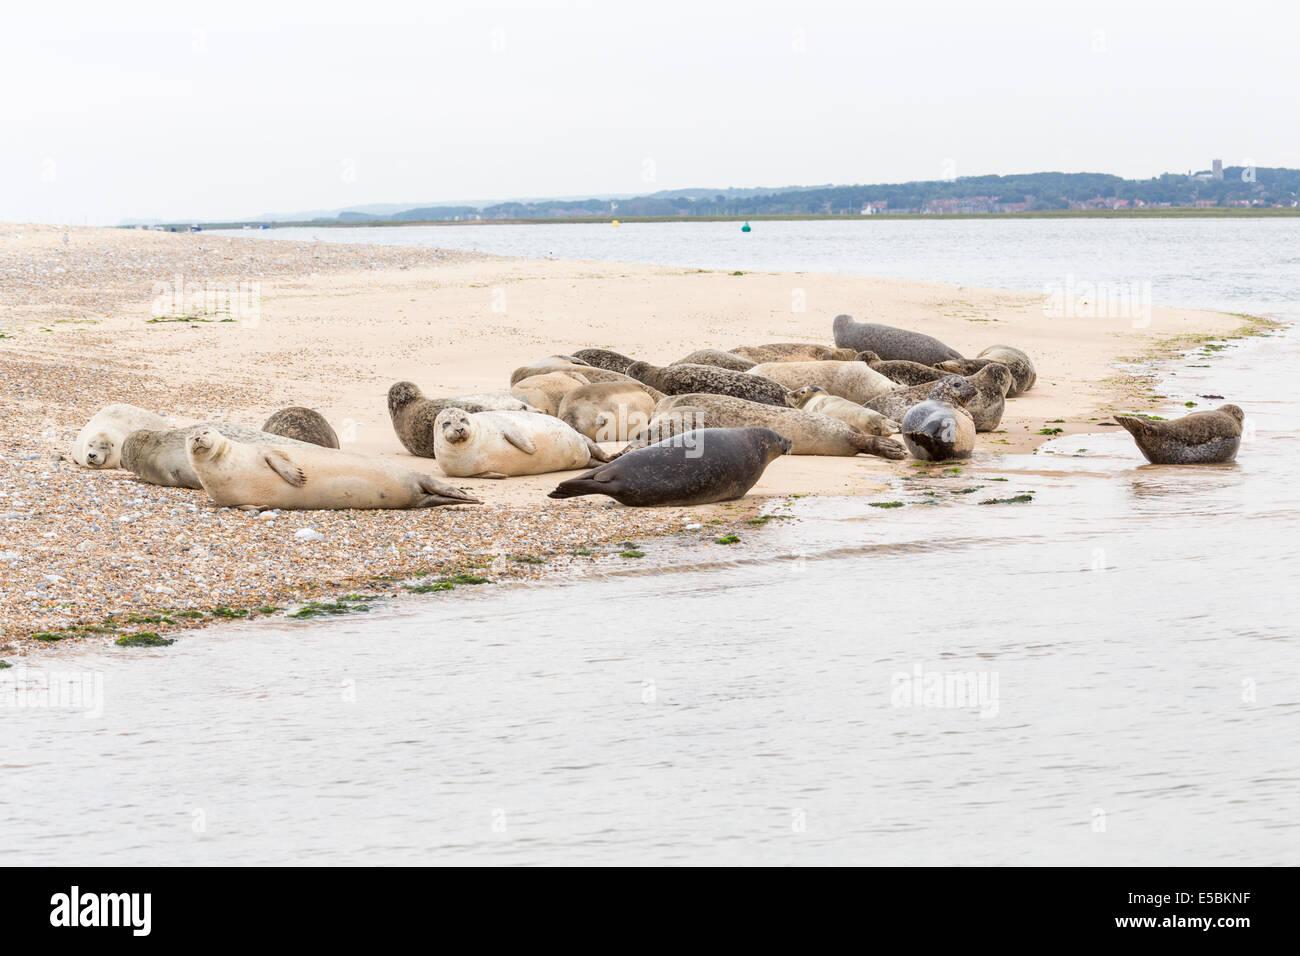 Sleepy common seals (Phoca vitulina) laze on the shore at Blakeney Point, north Norfolk - Stock Image